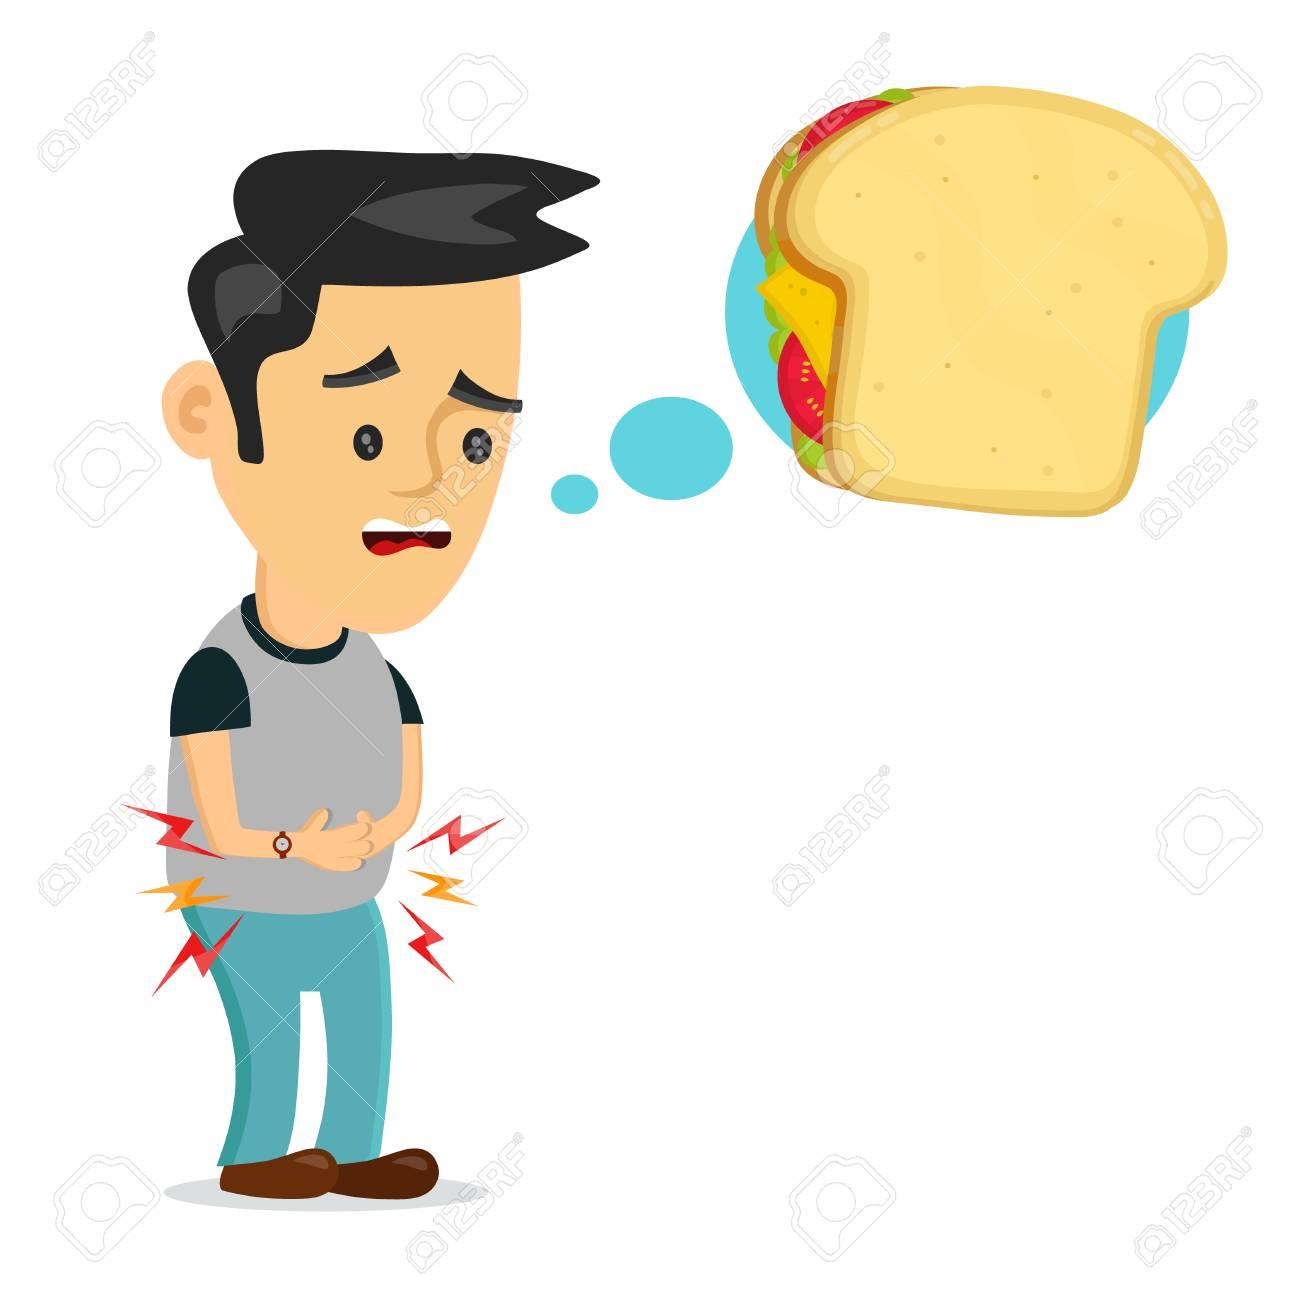 Hungry man thinking about sandwich. - 87529314